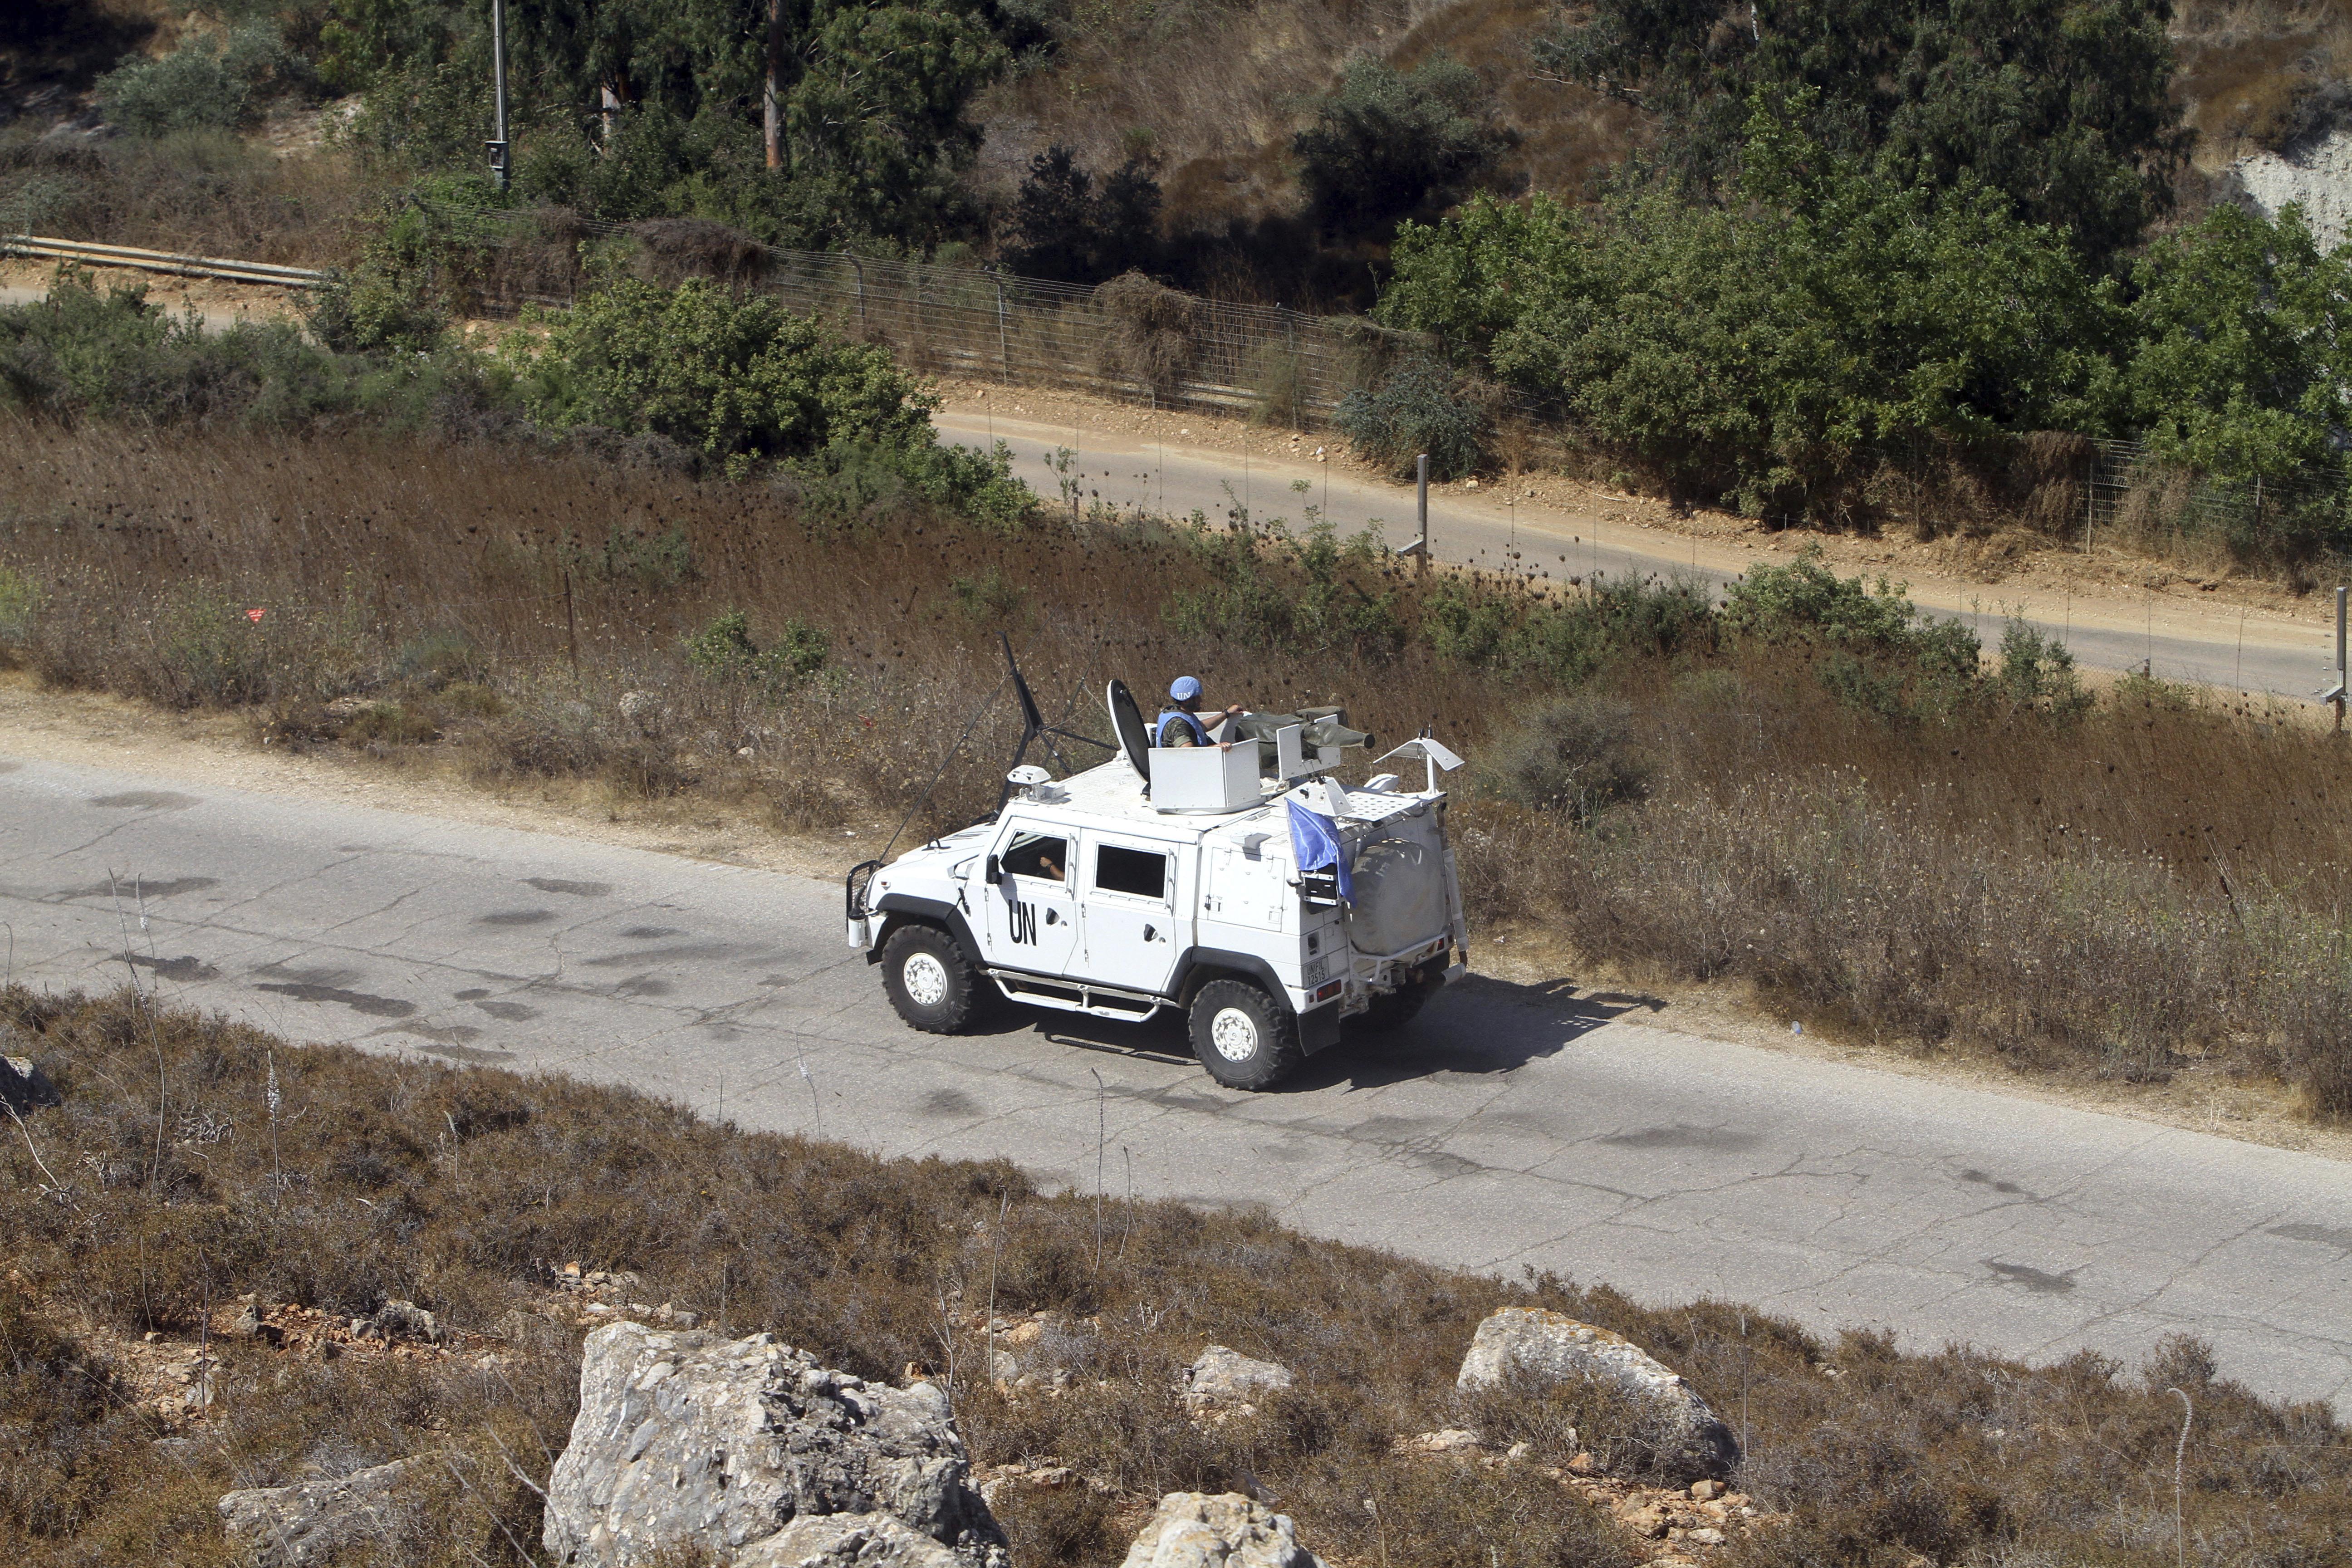 Lebanon: Israeli air force hits Palestinian base in Lebanon